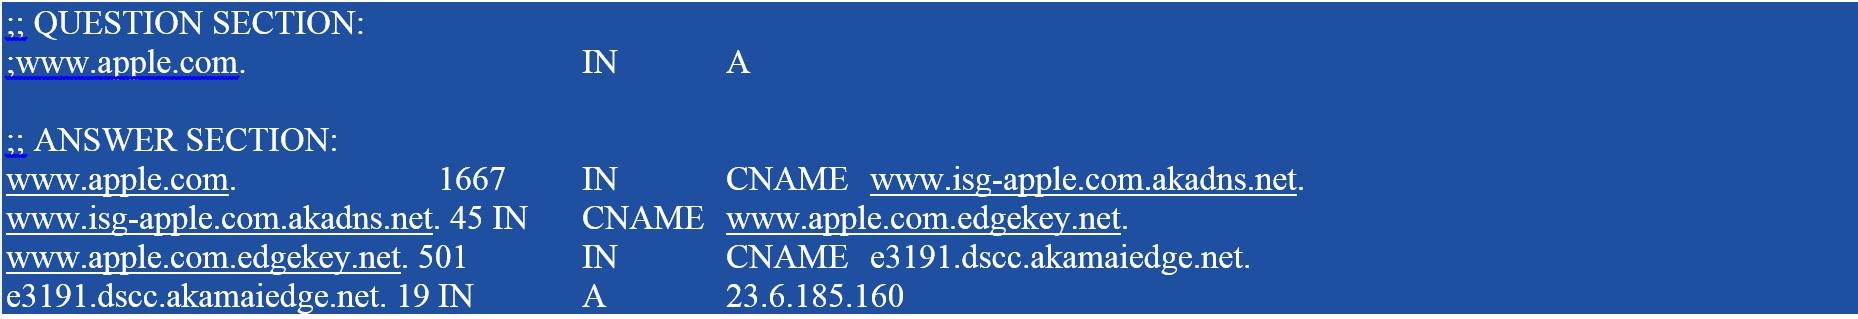 DIG apple.com